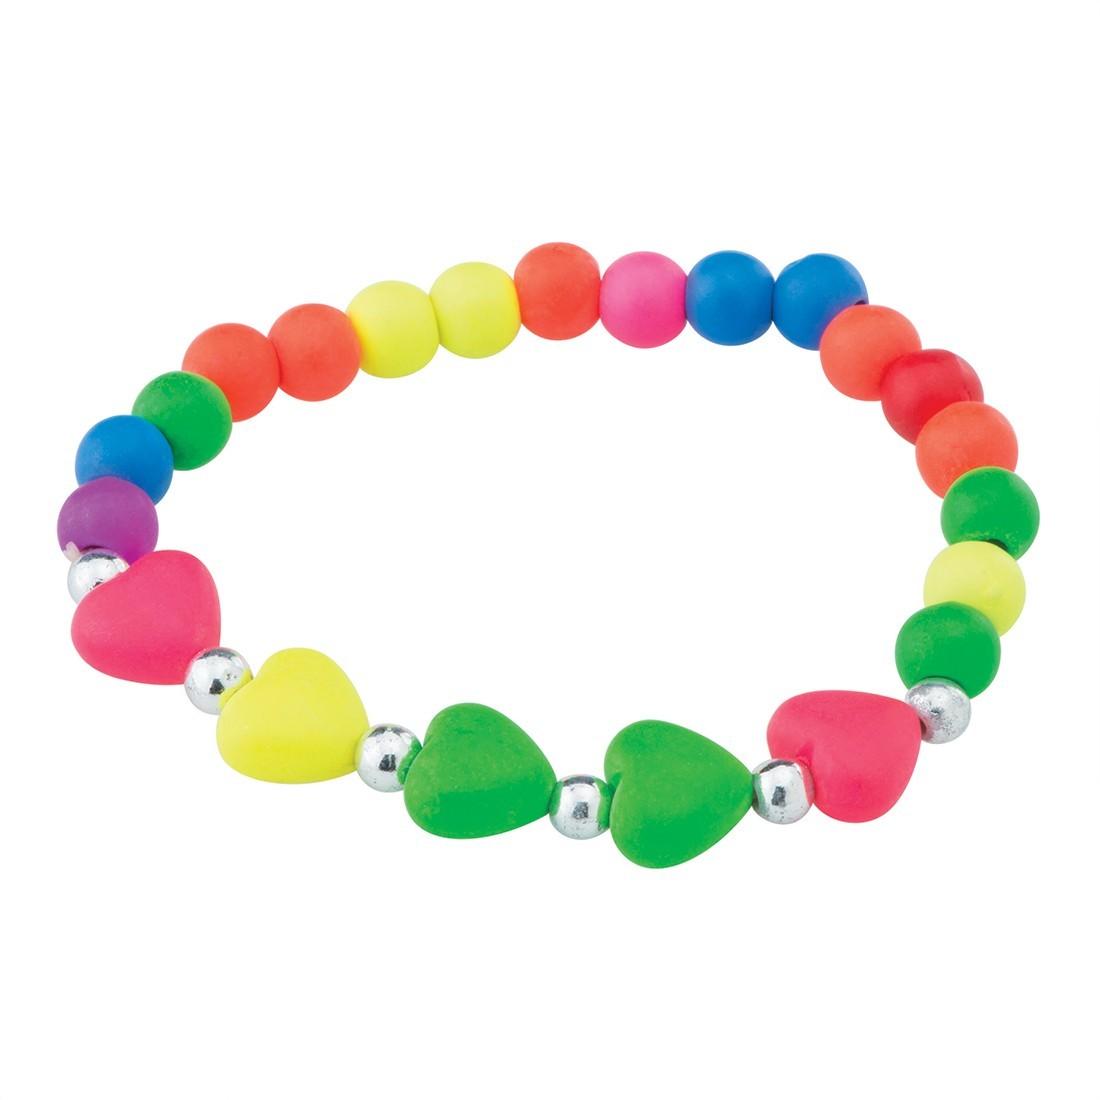 Stretchy Heart Bead Bracelets  [image]